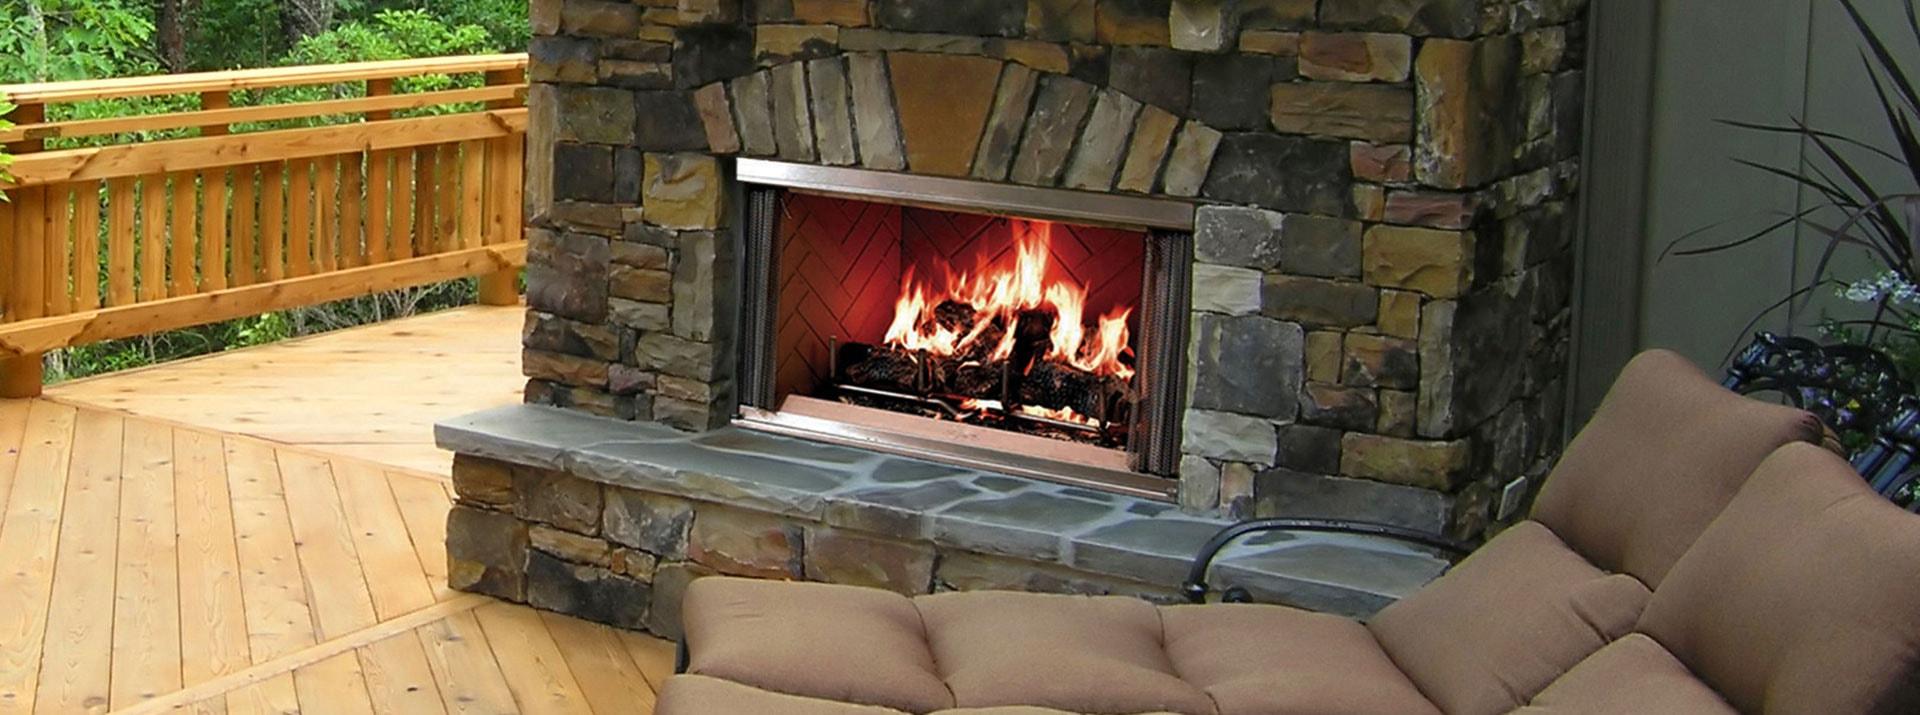 Montana Wood Burning Outdoor Fireplace Monessen Hearth